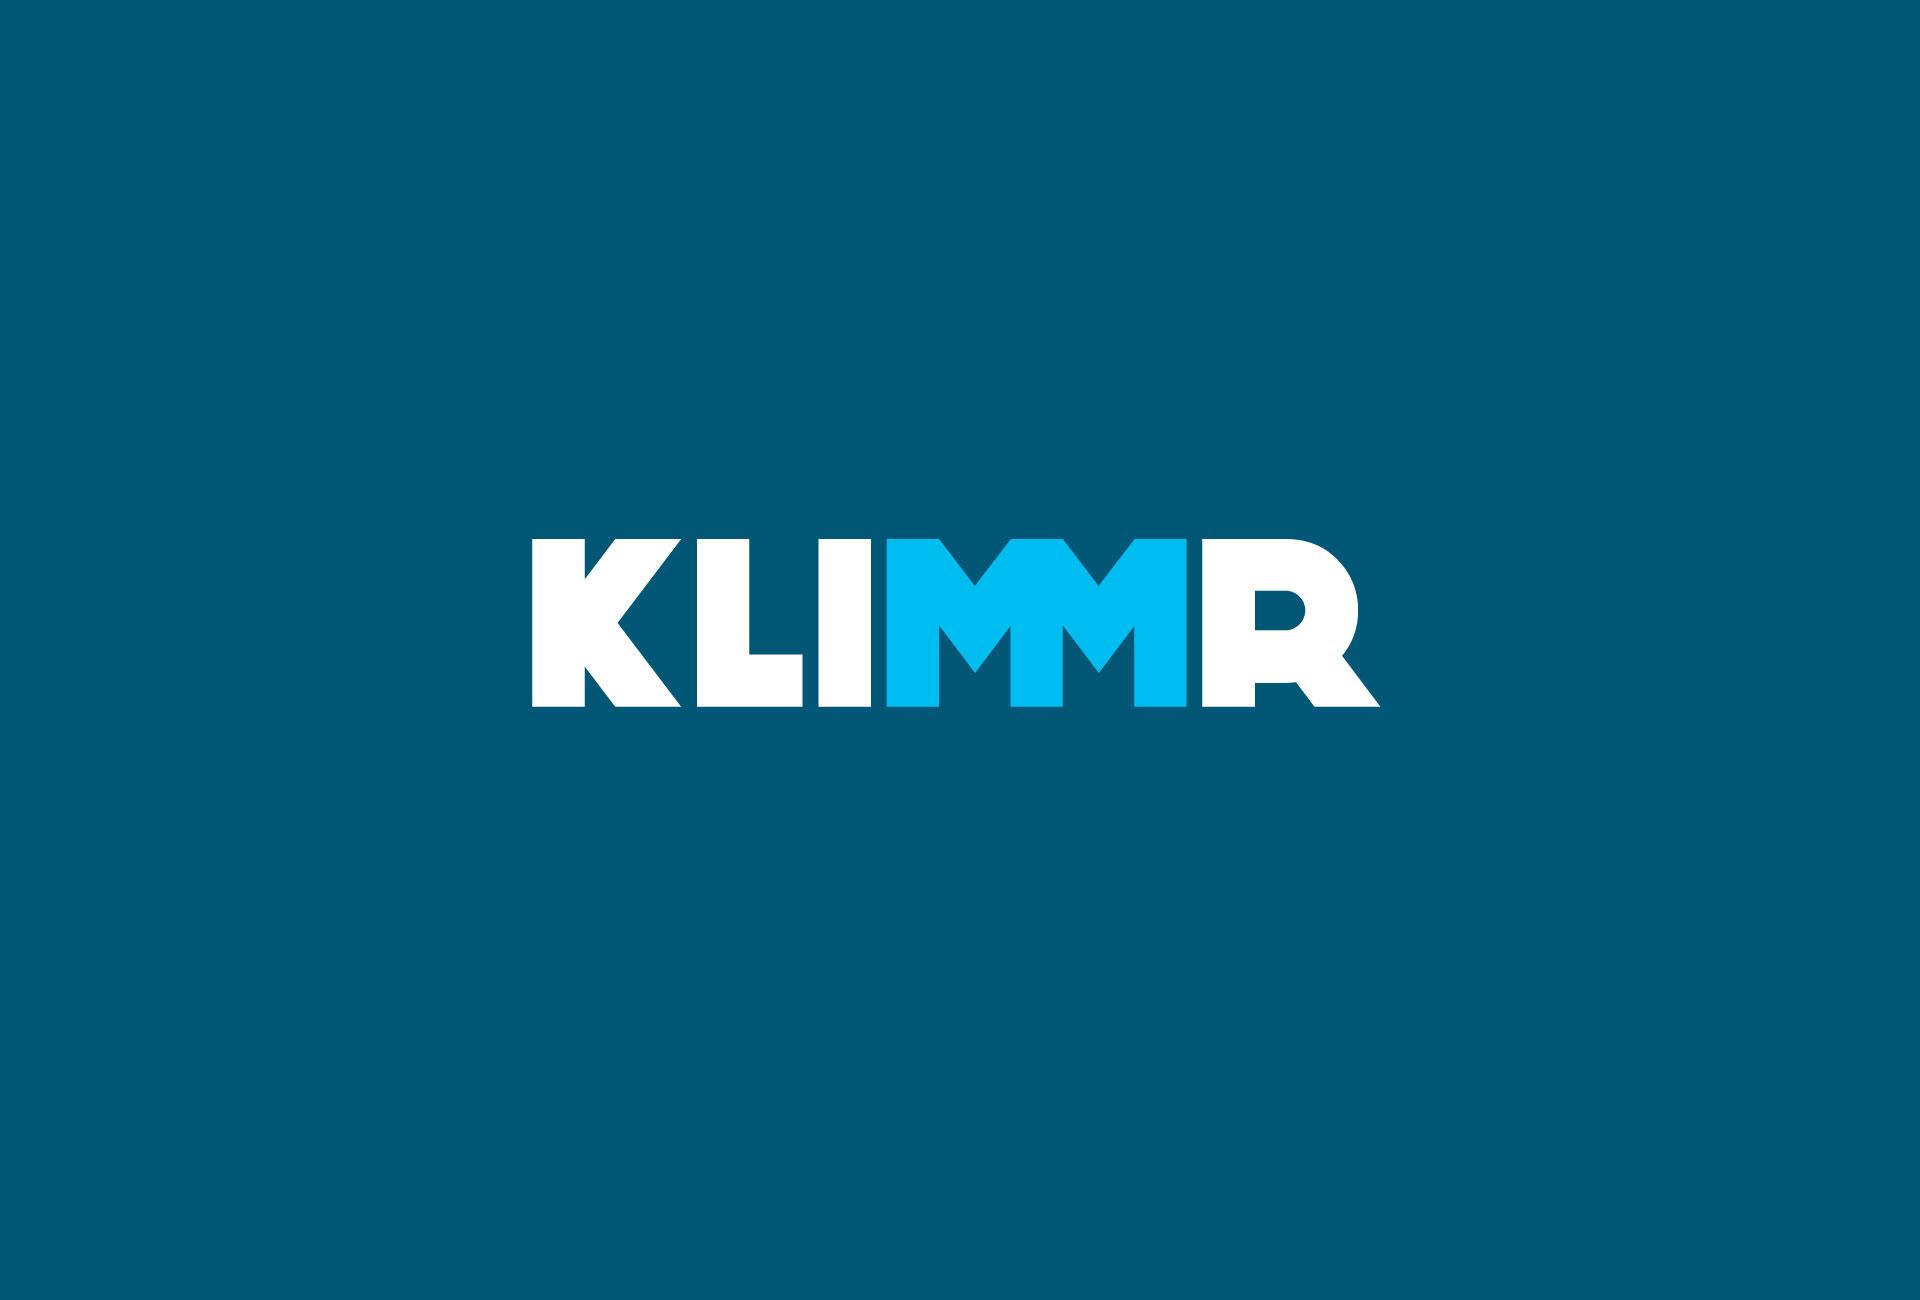 KLIMMR Huisstijl logo blauw